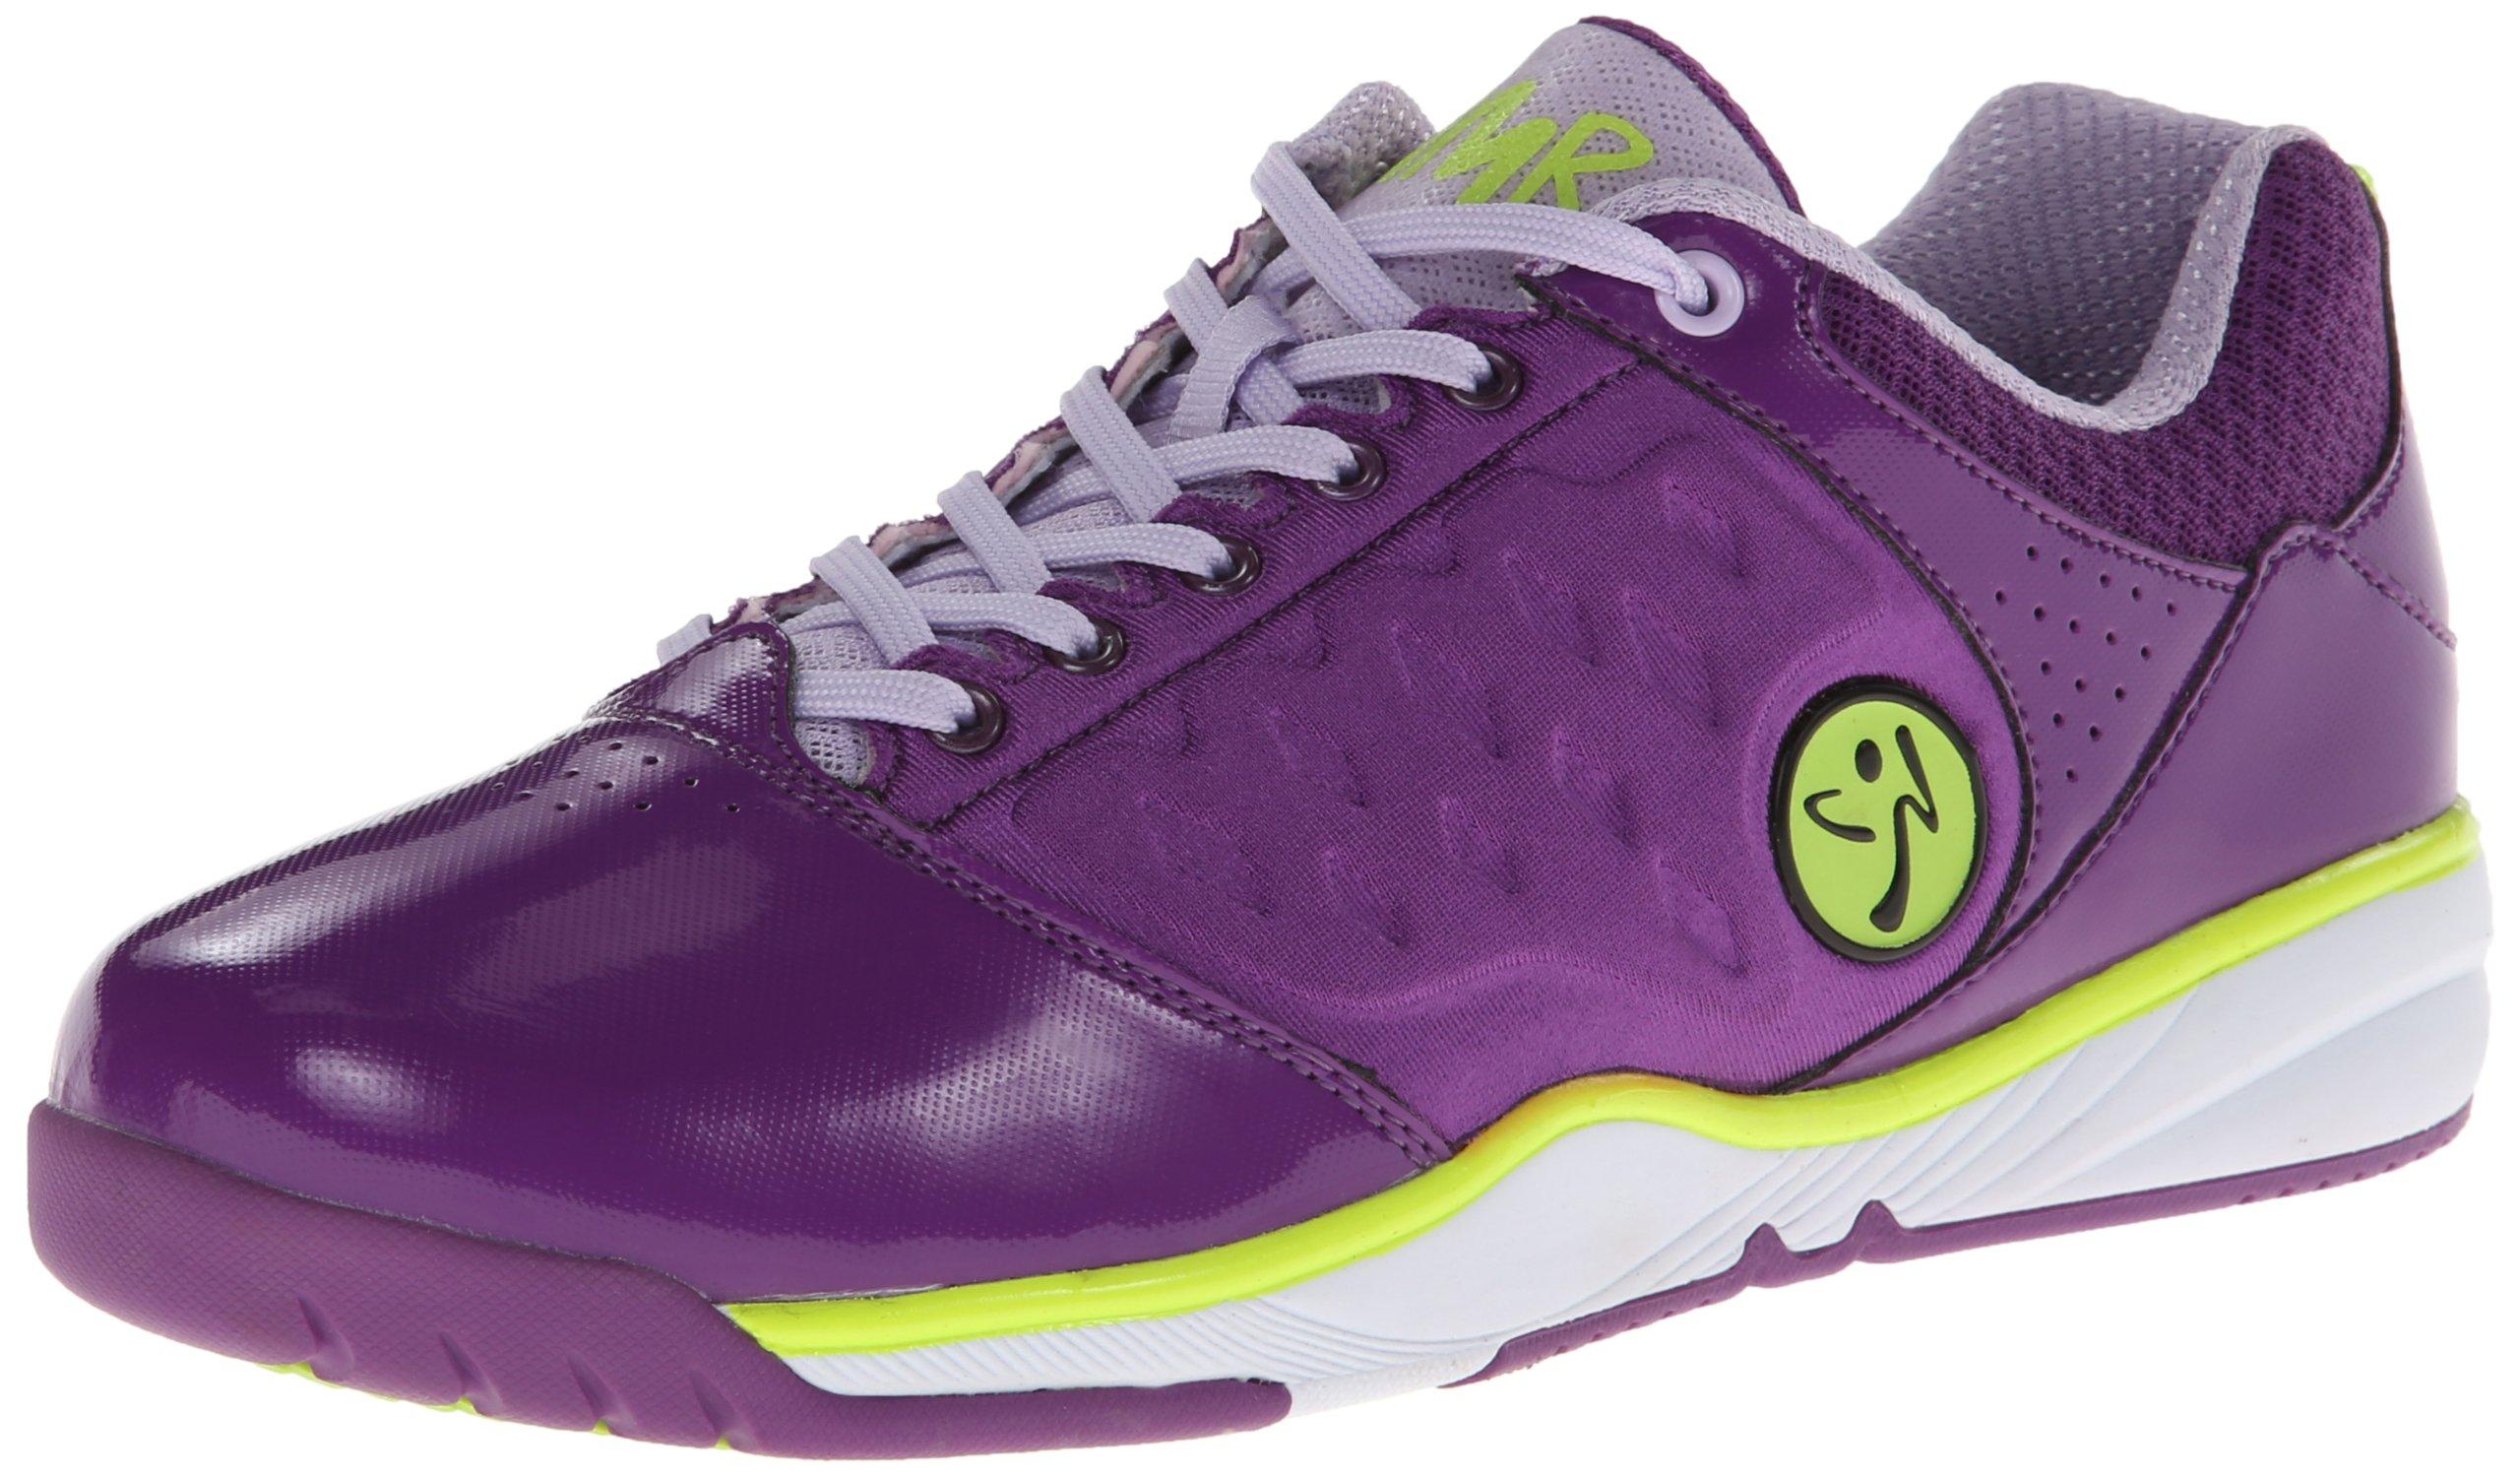 Zumba Women's Energy Push-W Dance Shoe Purple/Lavender 10 M US